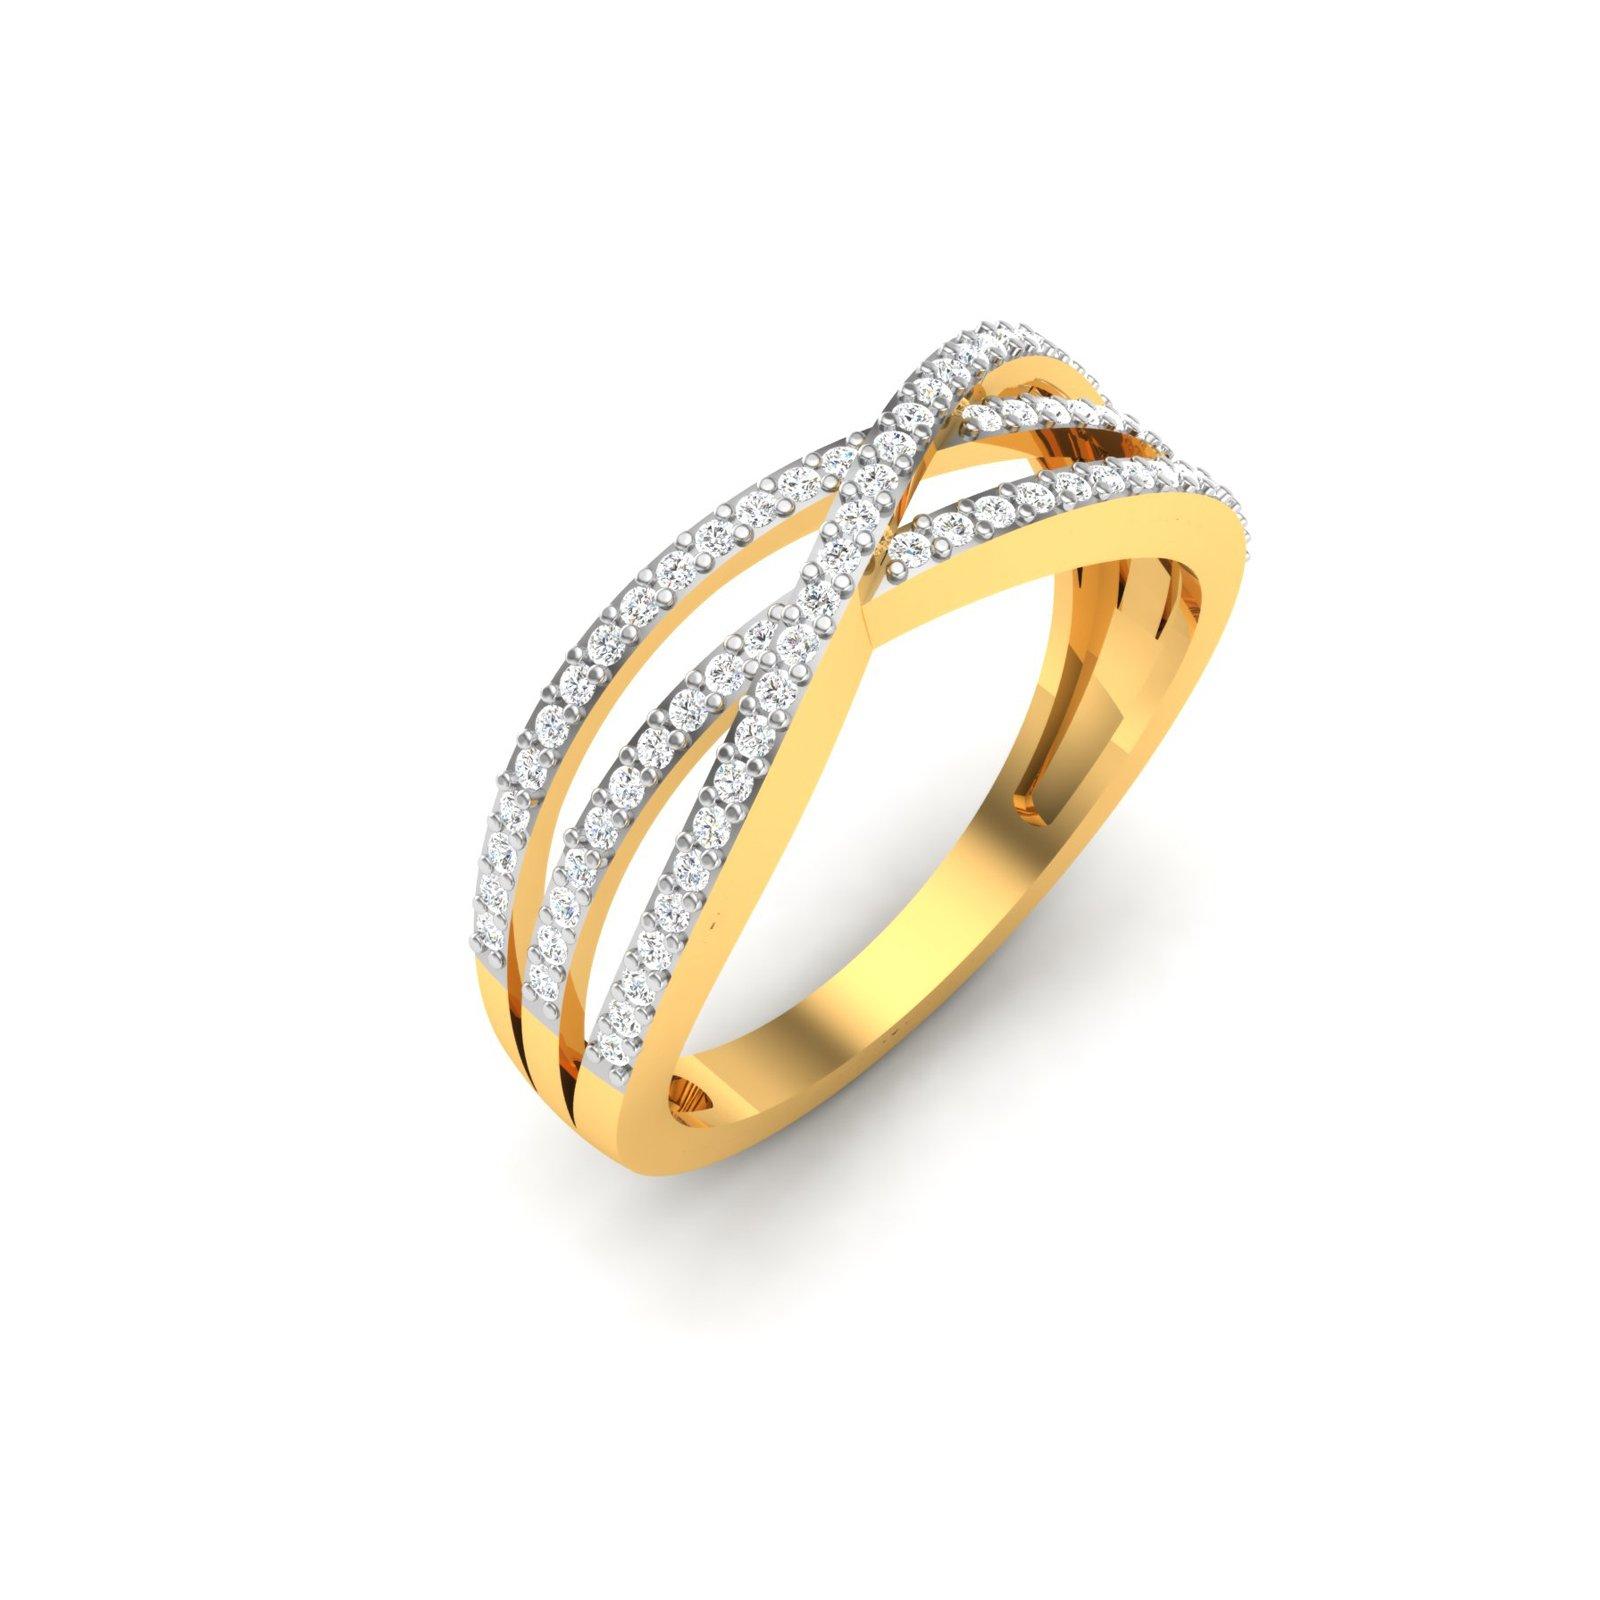 Lavender Gold Ring